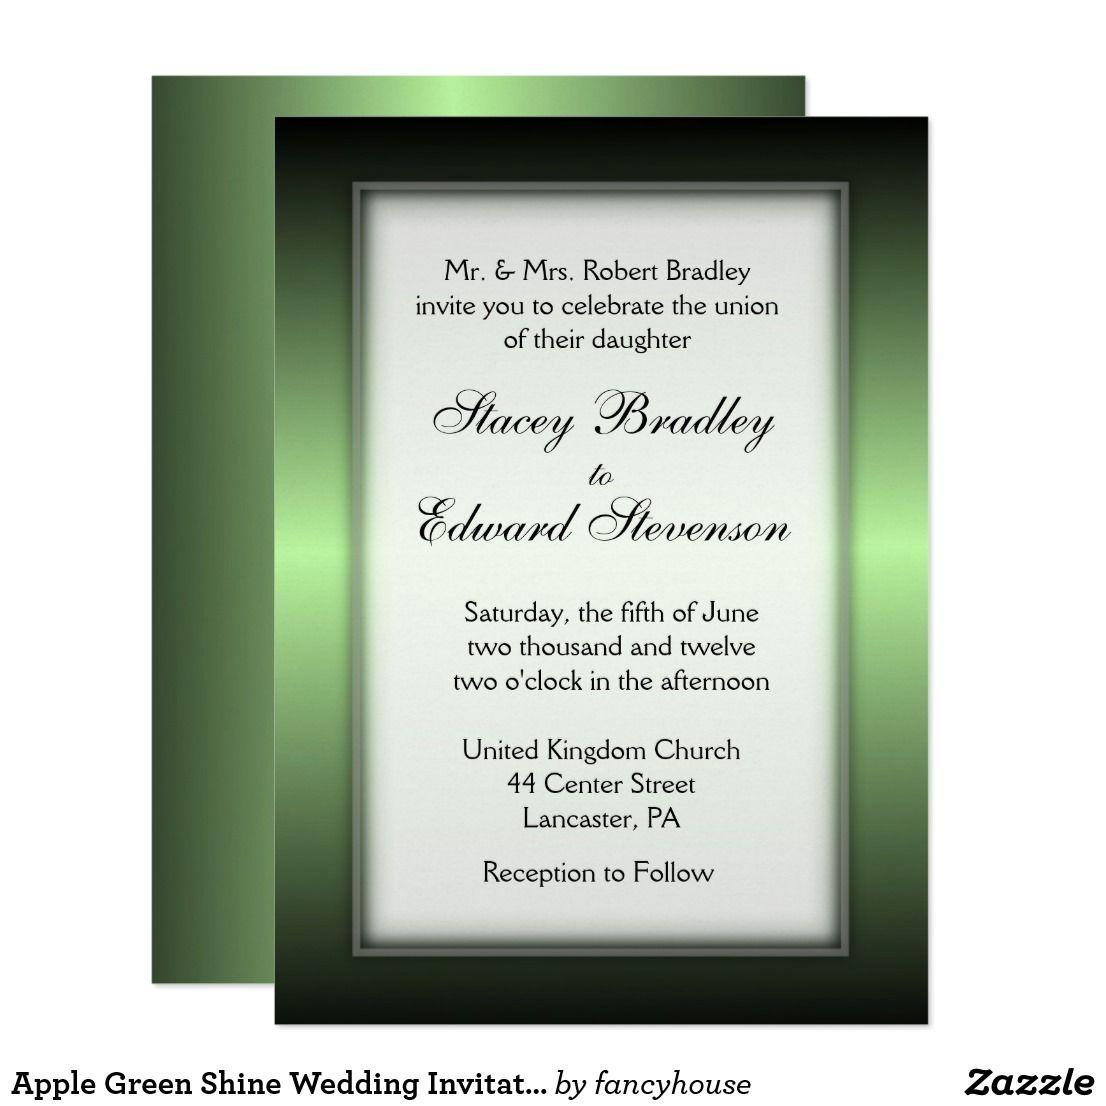 Apple green shine wedding invitation off green wedding